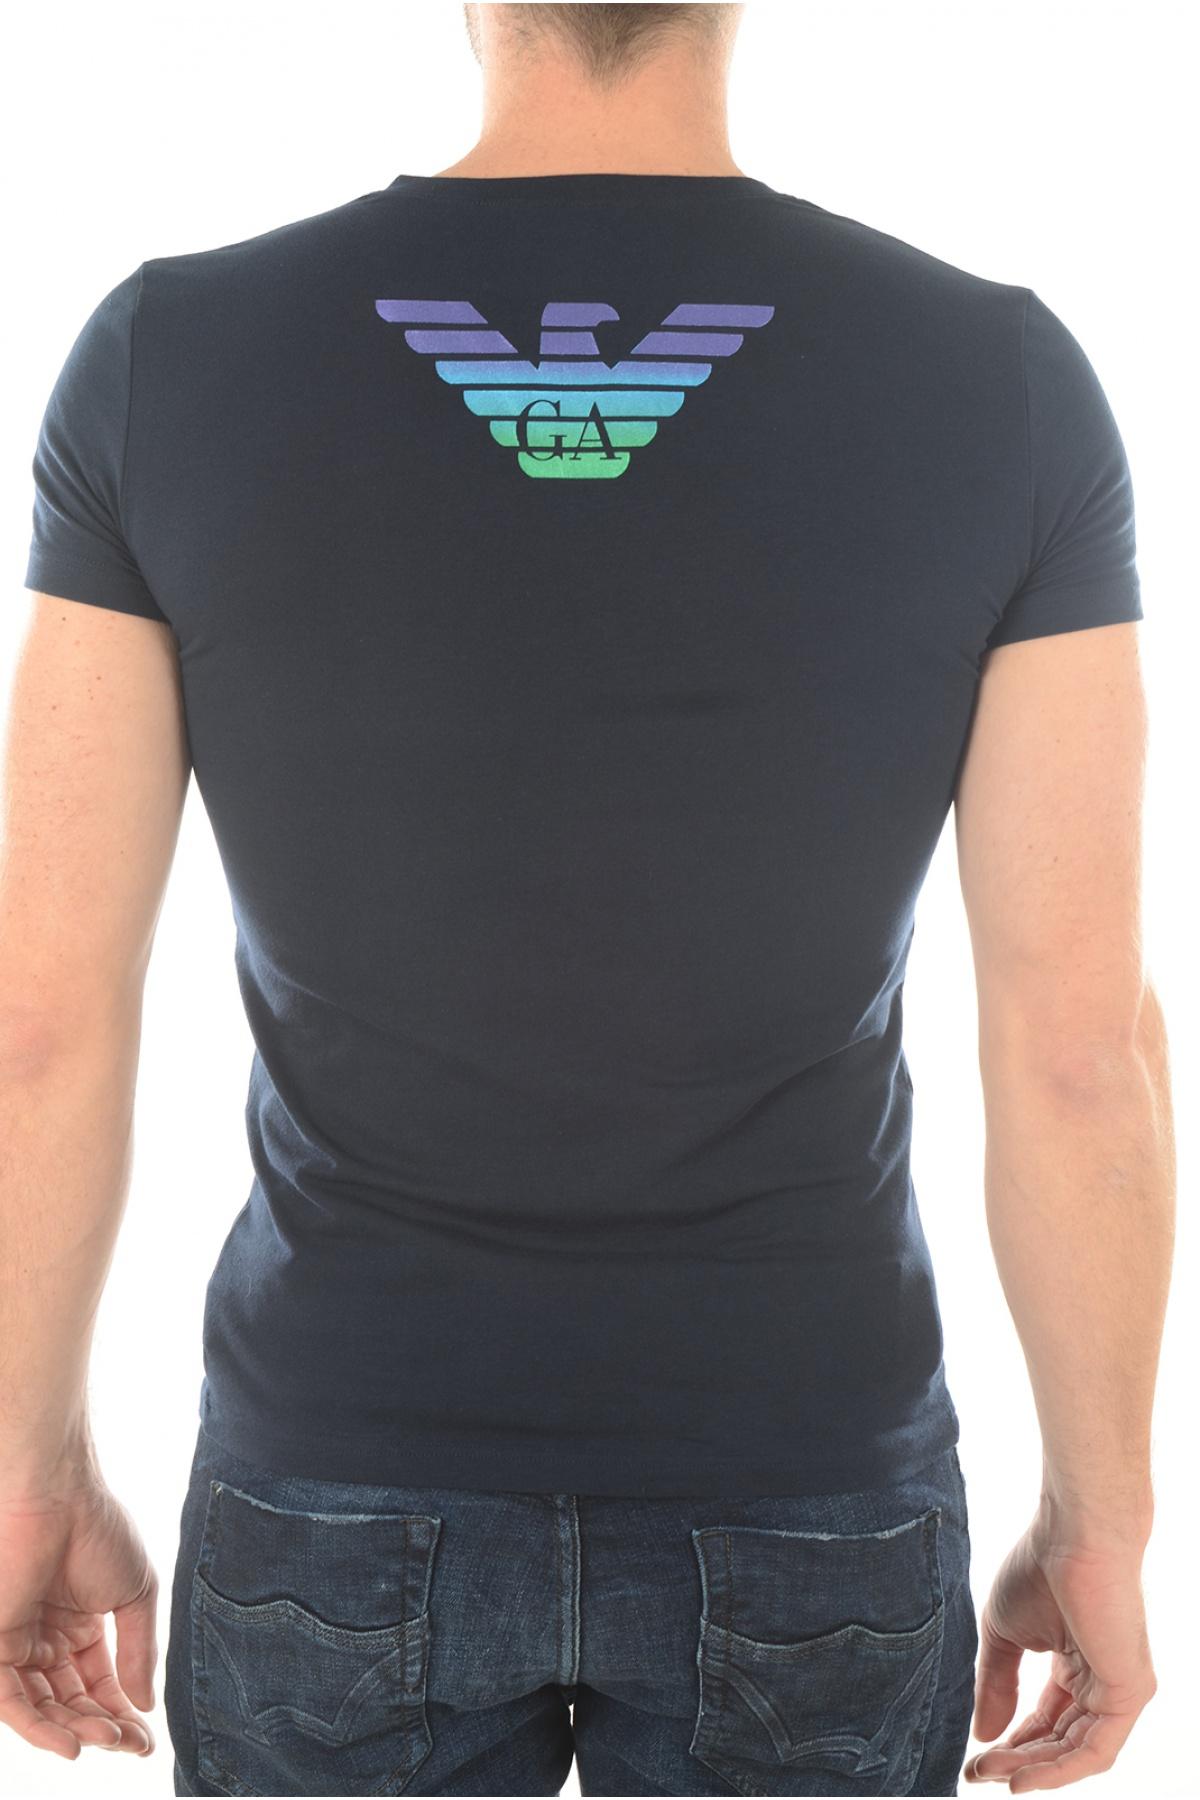 Tee-shirts manches courtes EMPORIO ARMANI